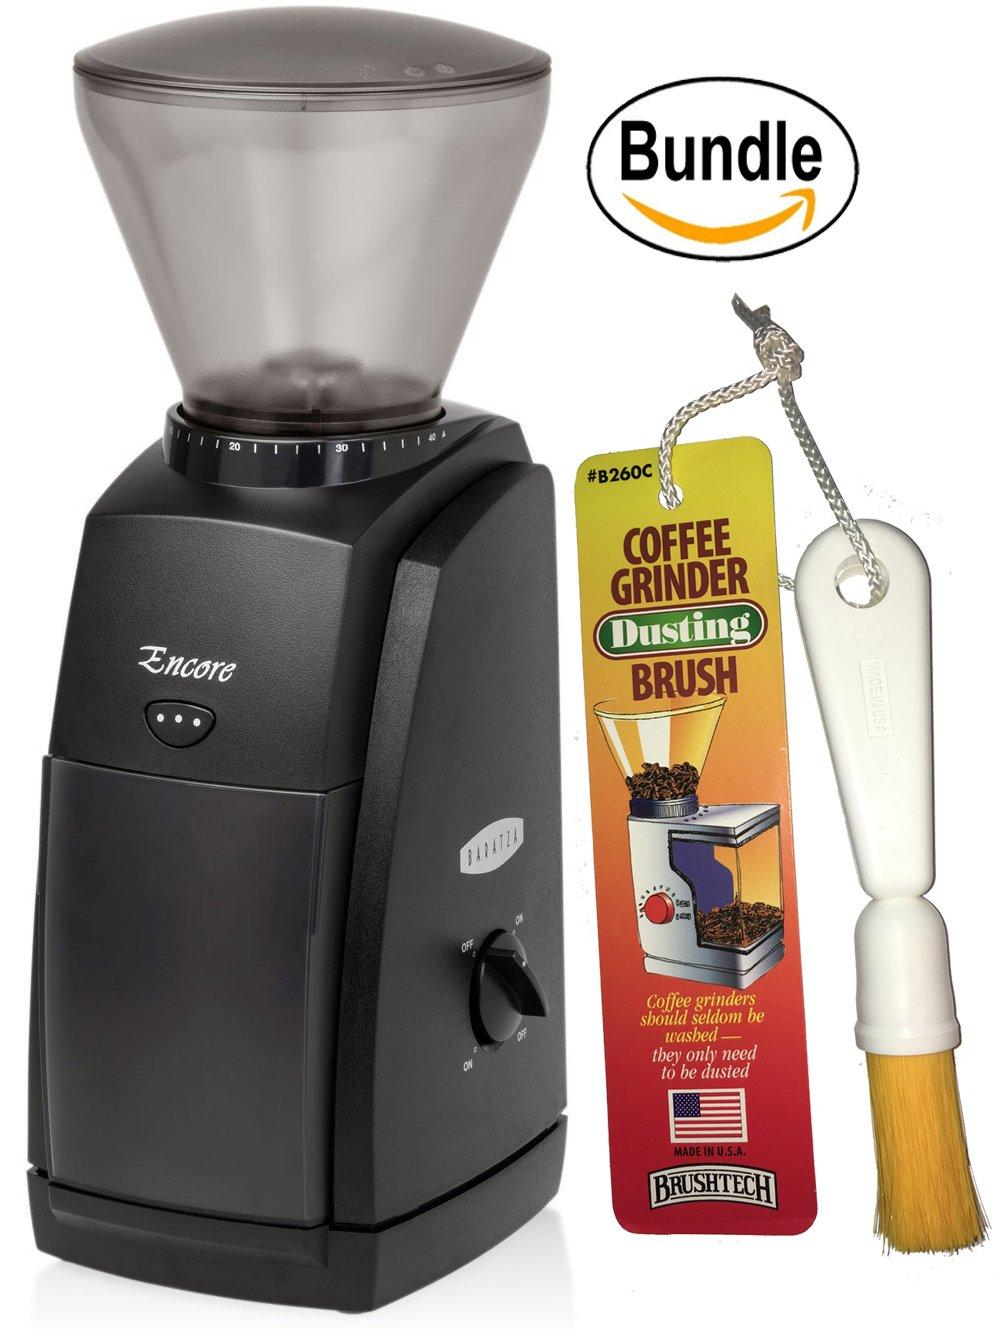 Baratza Encore 485 Conical Burr Coffee Grinder & Brushtech Coffee Grinder Dusting Brush (Bundle)